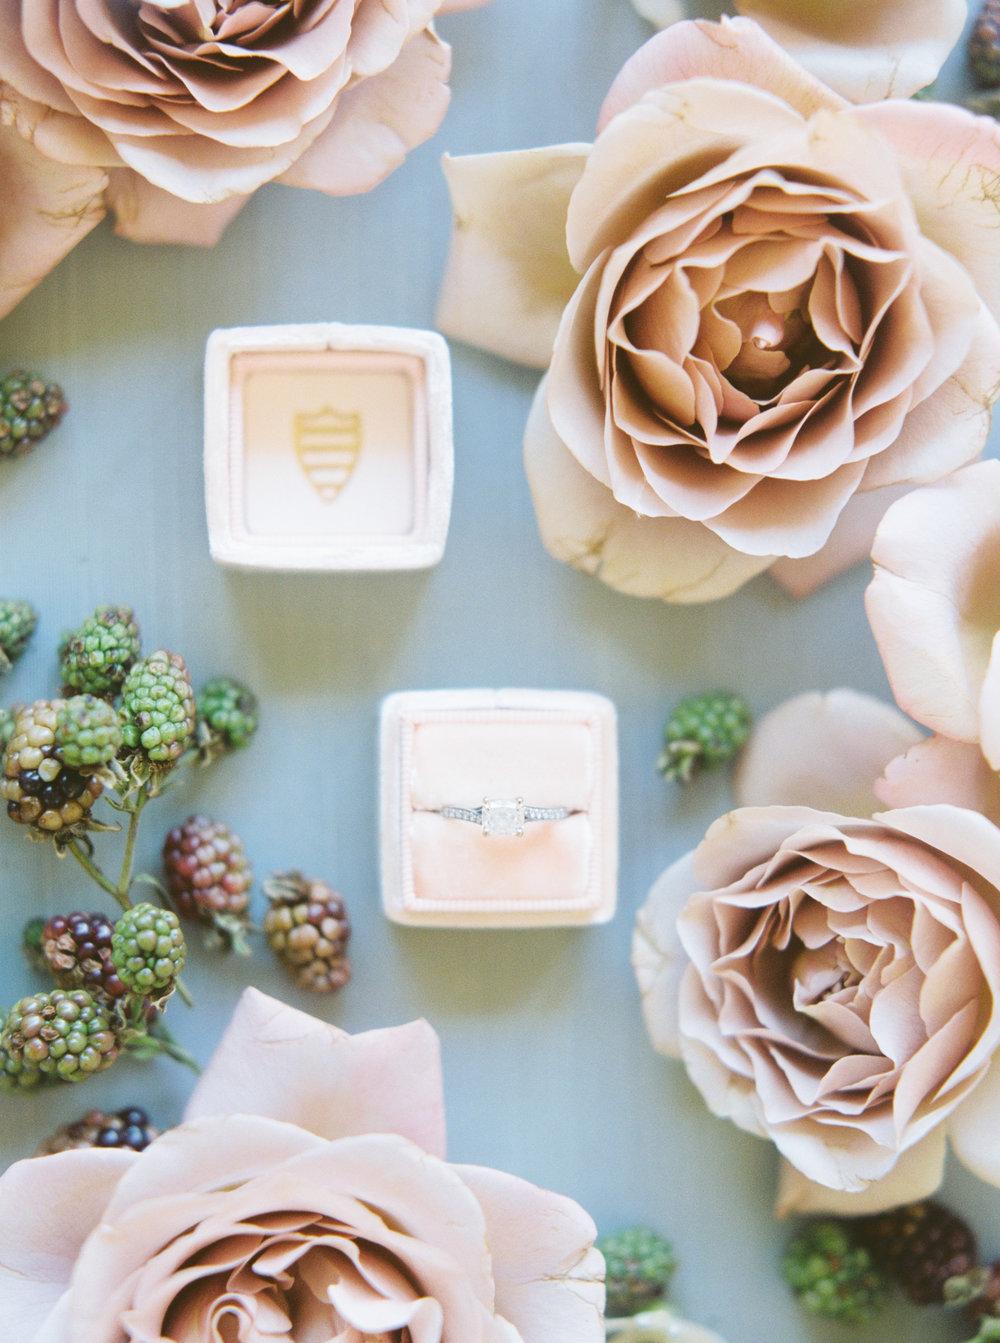 Austin Florist Garden Roses Wedding Ring